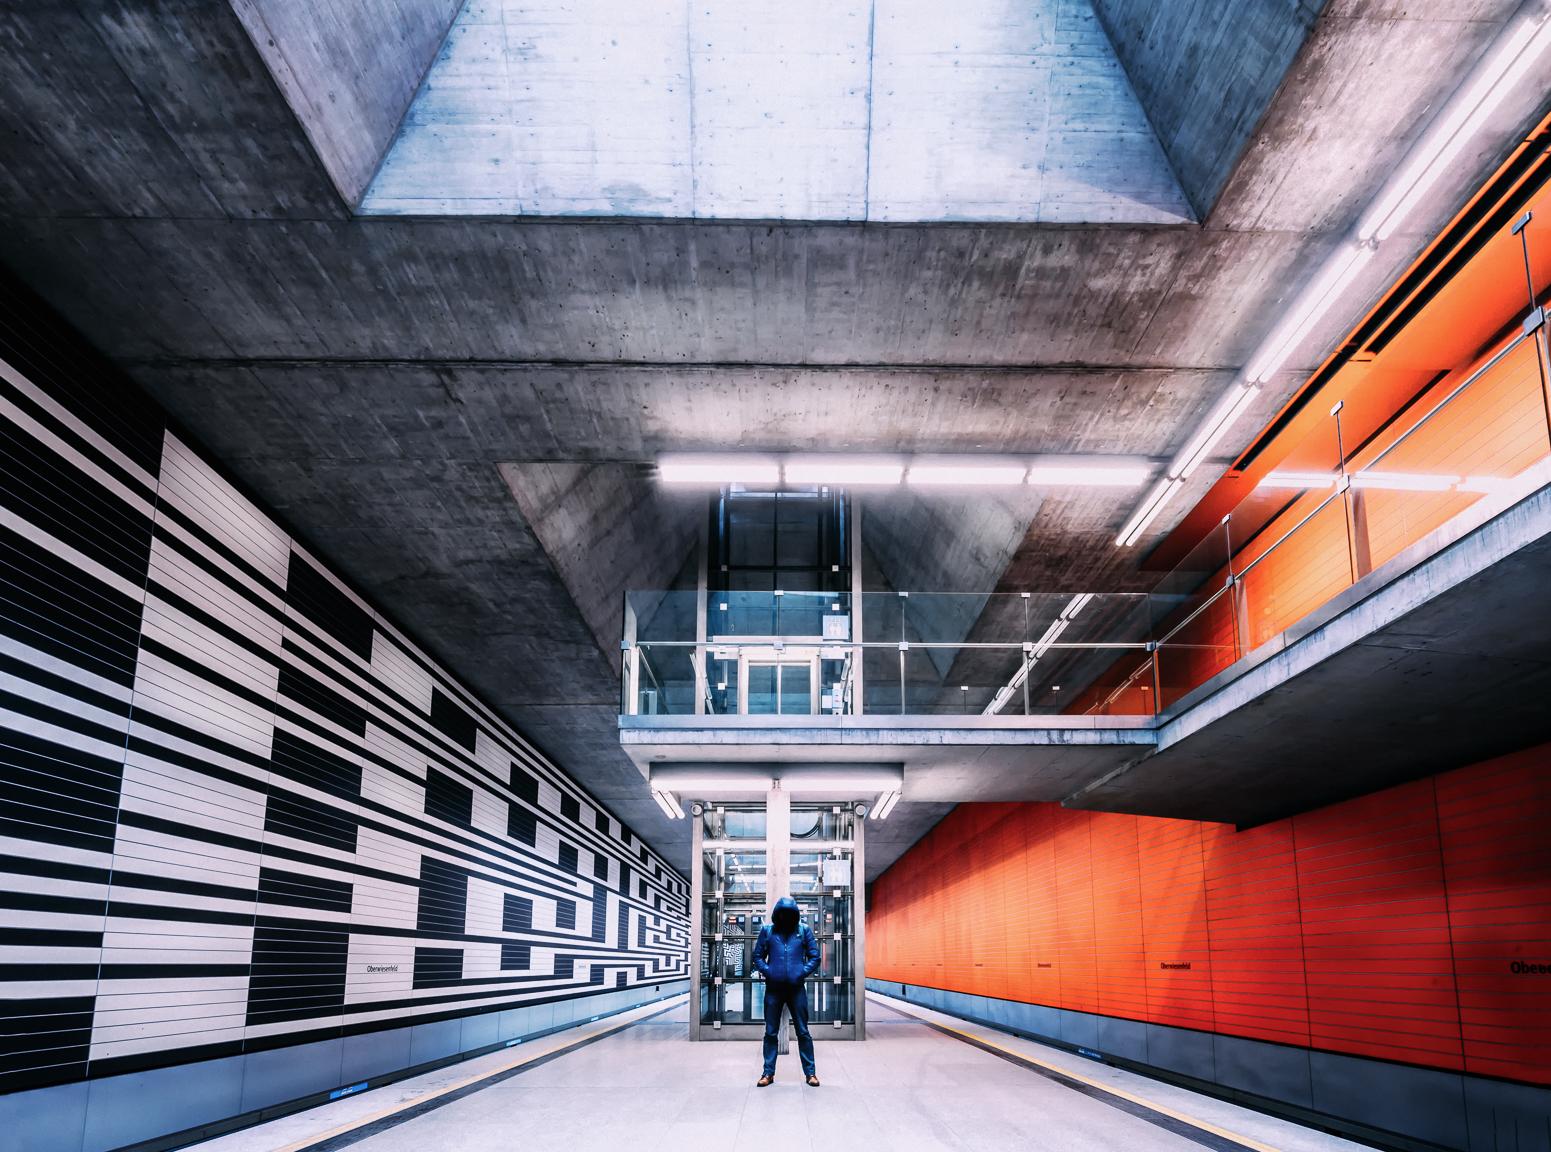 wallpaper symmetry symmetrie geometrie geometry lines urban urbex metrostation metro. Black Bedroom Furniture Sets. Home Design Ideas